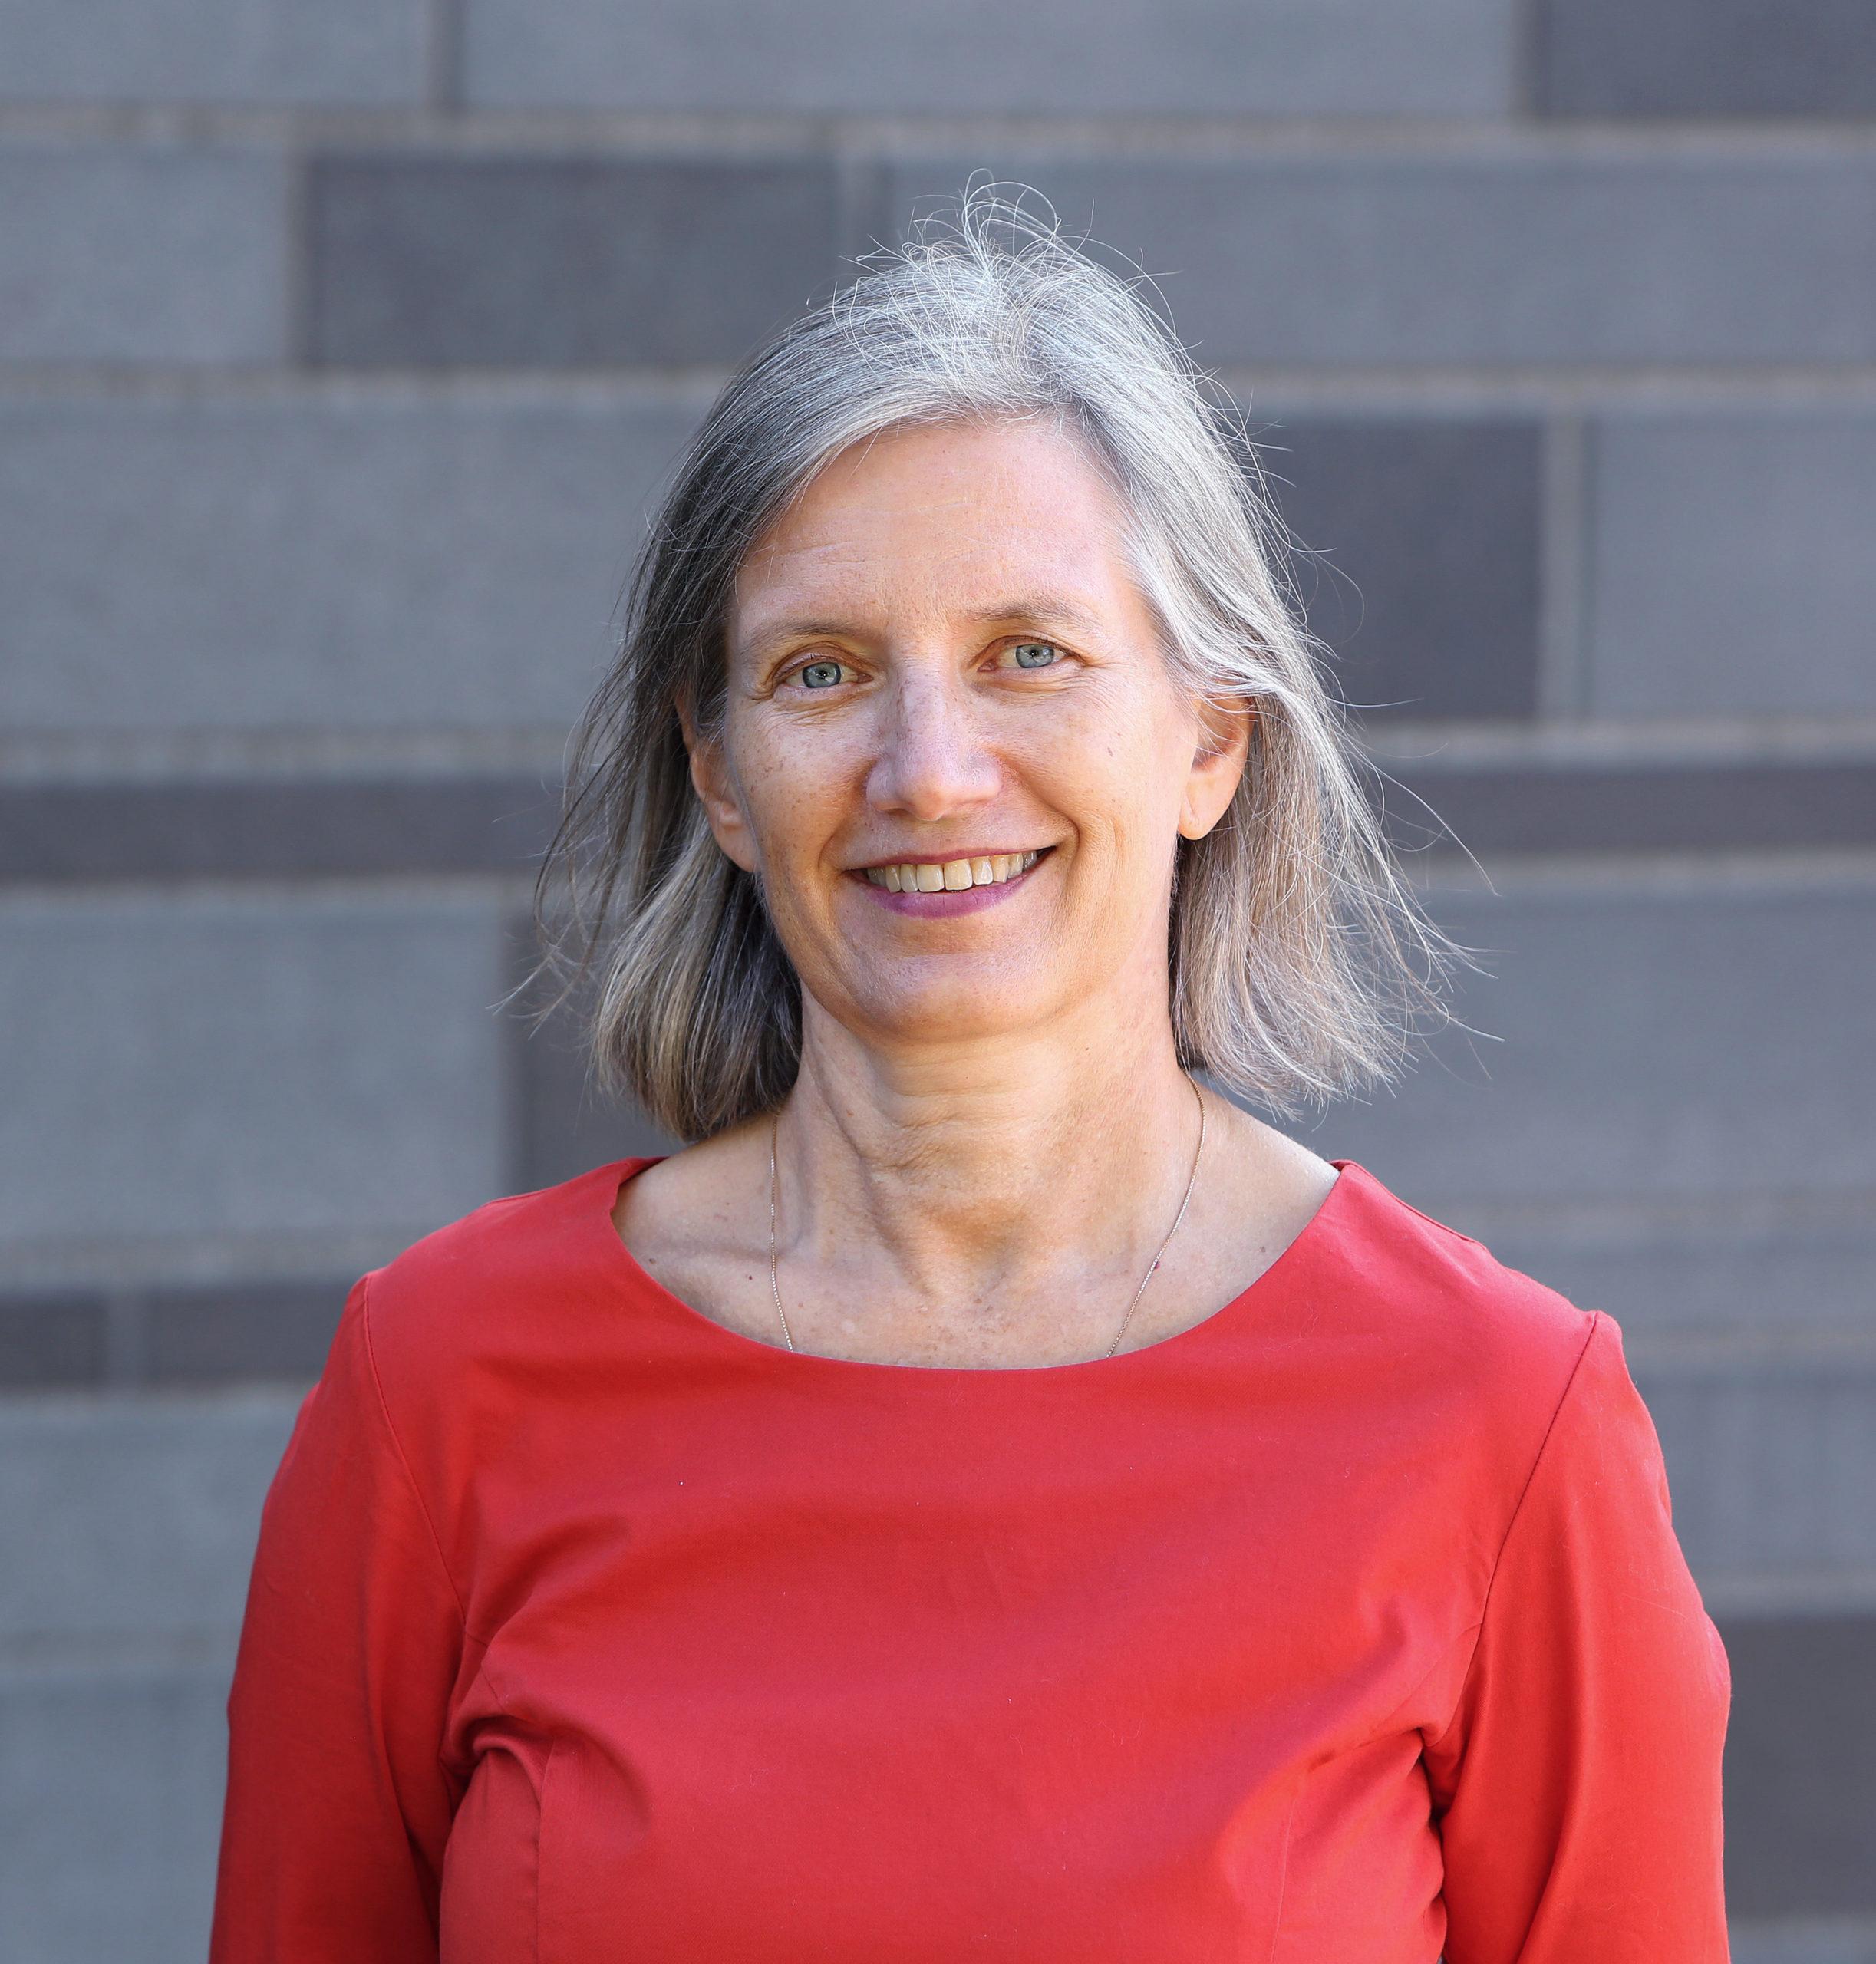 Sonja Gummerus